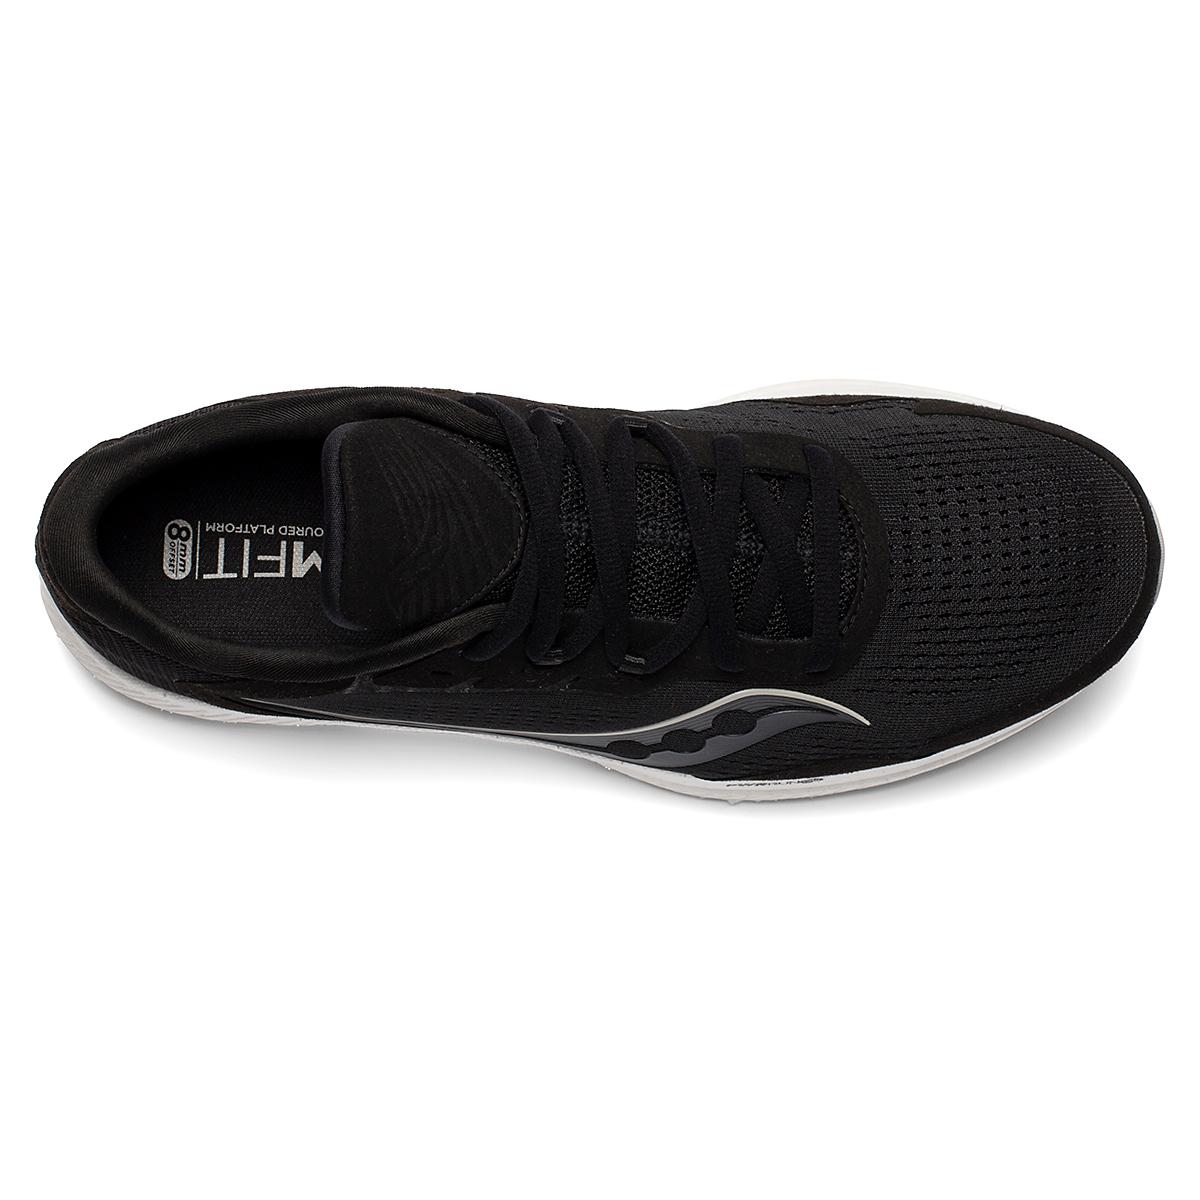 Men's Saucony Freedom 4 Running Shoe - Color: Black/Stone - Size: 7 - Width: Regular, Black/Stone, large, image 4